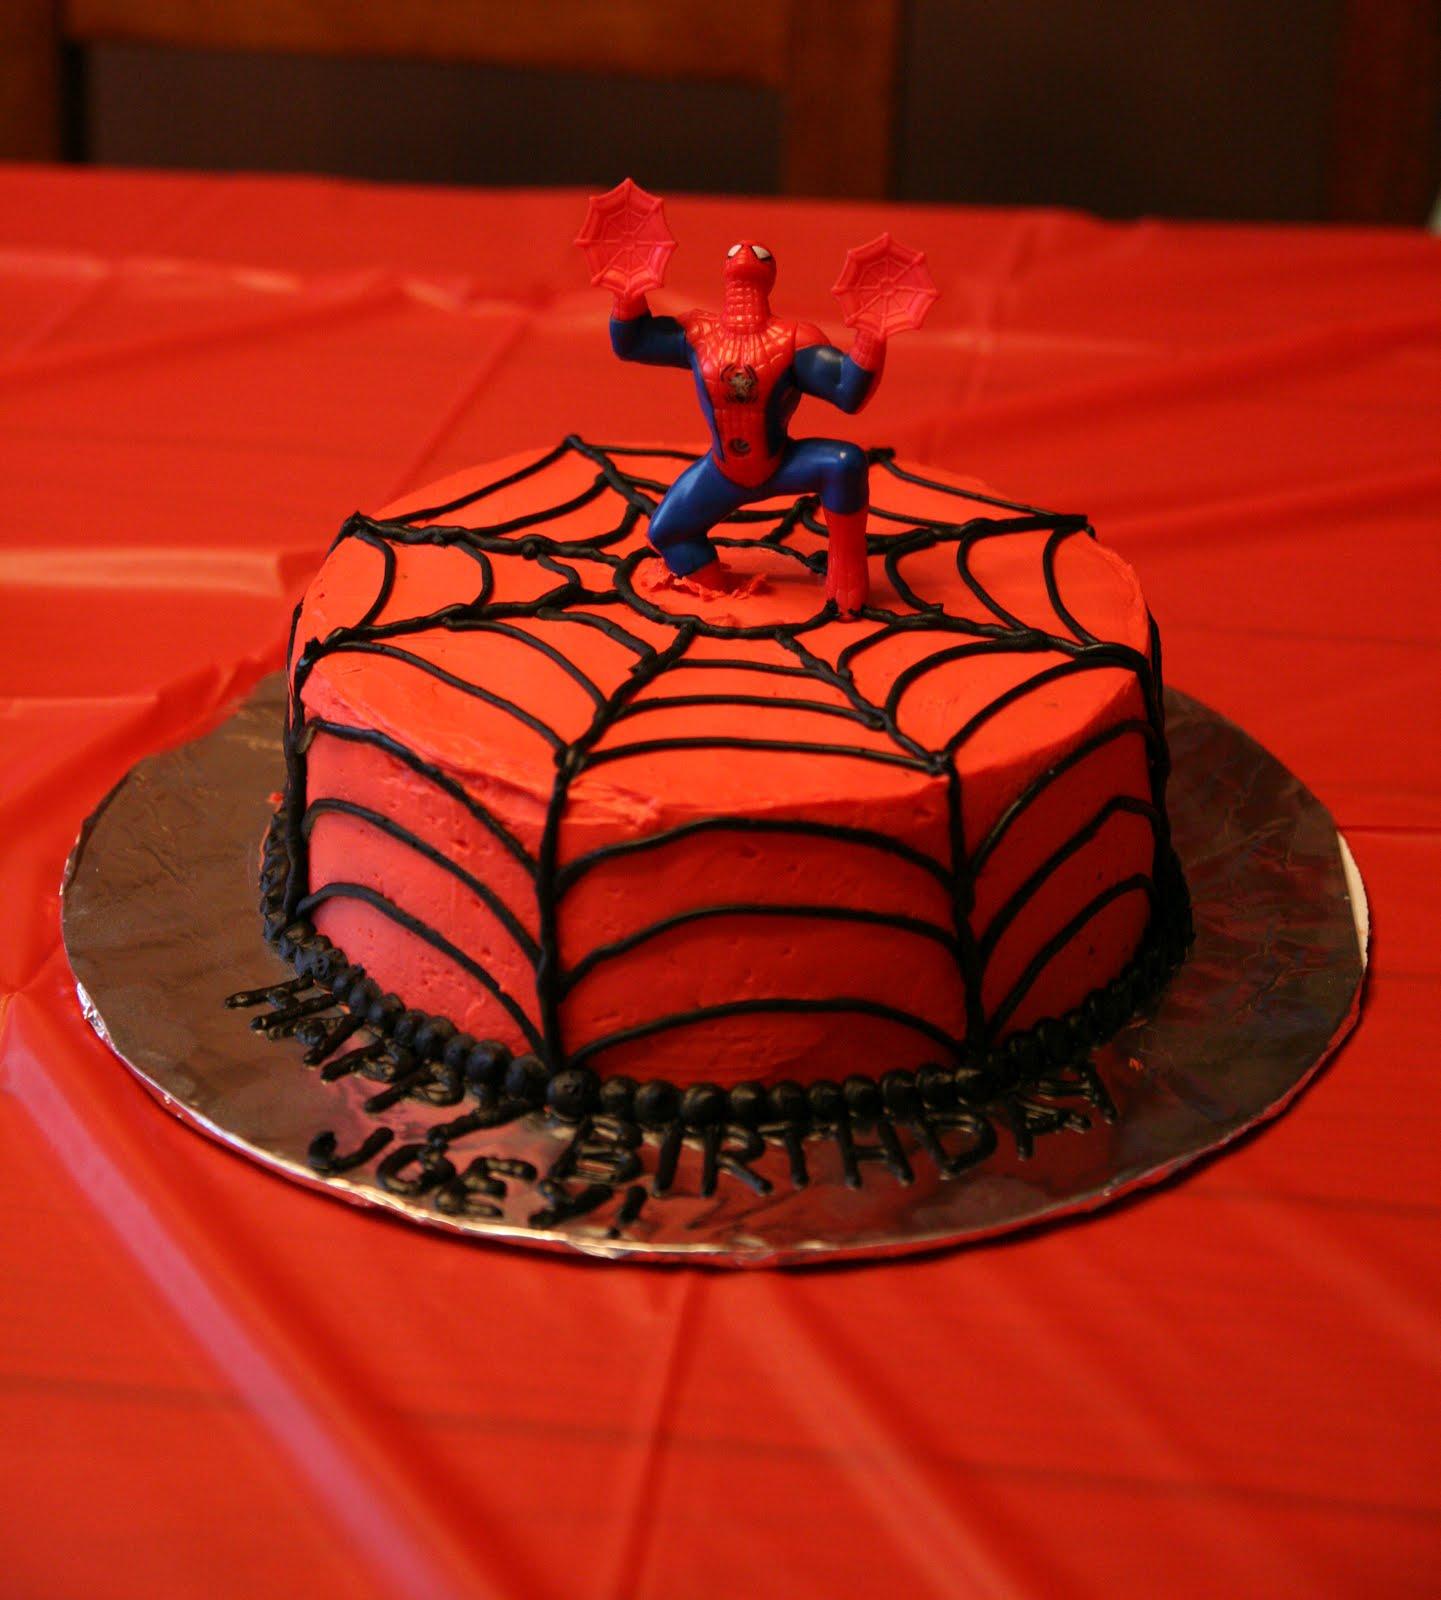 How To Make A Spiderman Birthday Cake Ideas